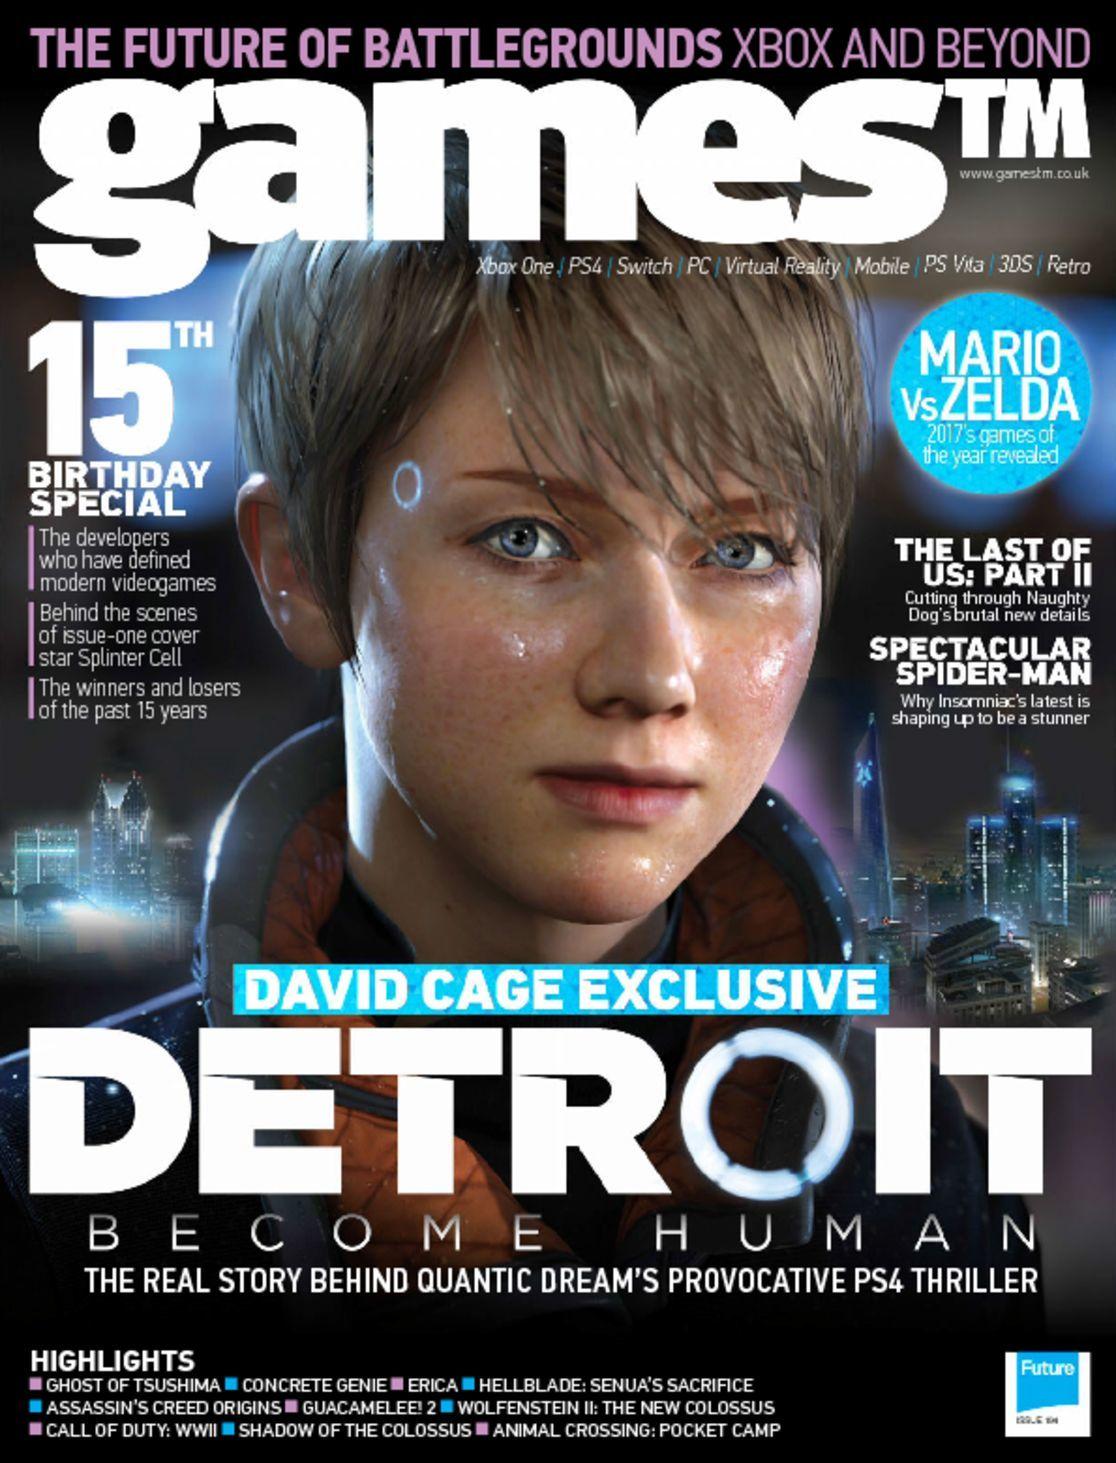 GamesTM Digital